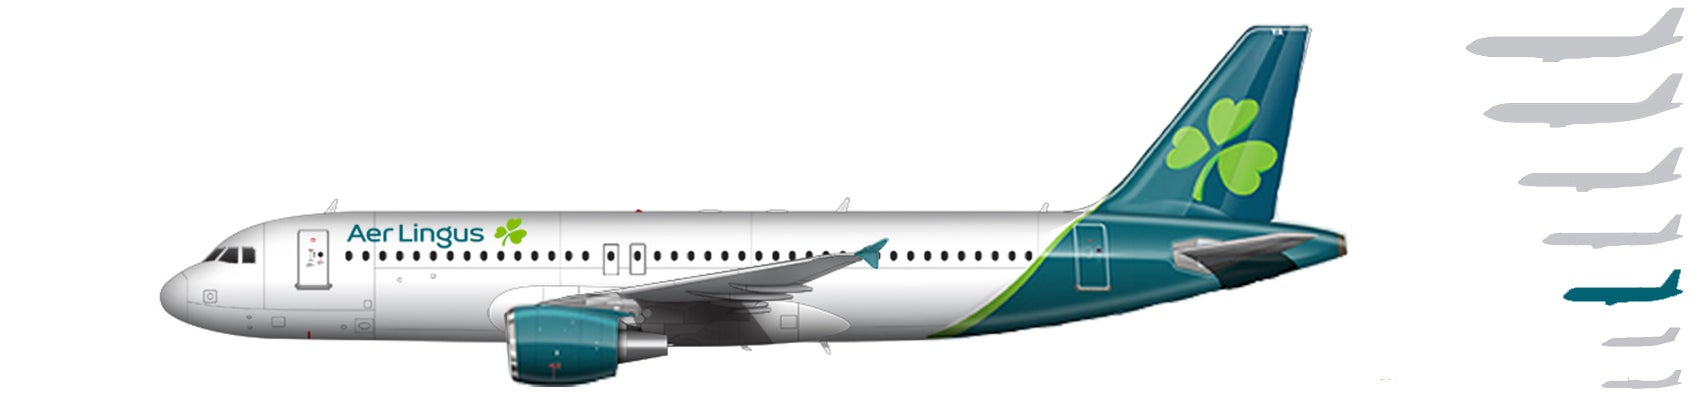 Airbus A320 - Aer Lingus